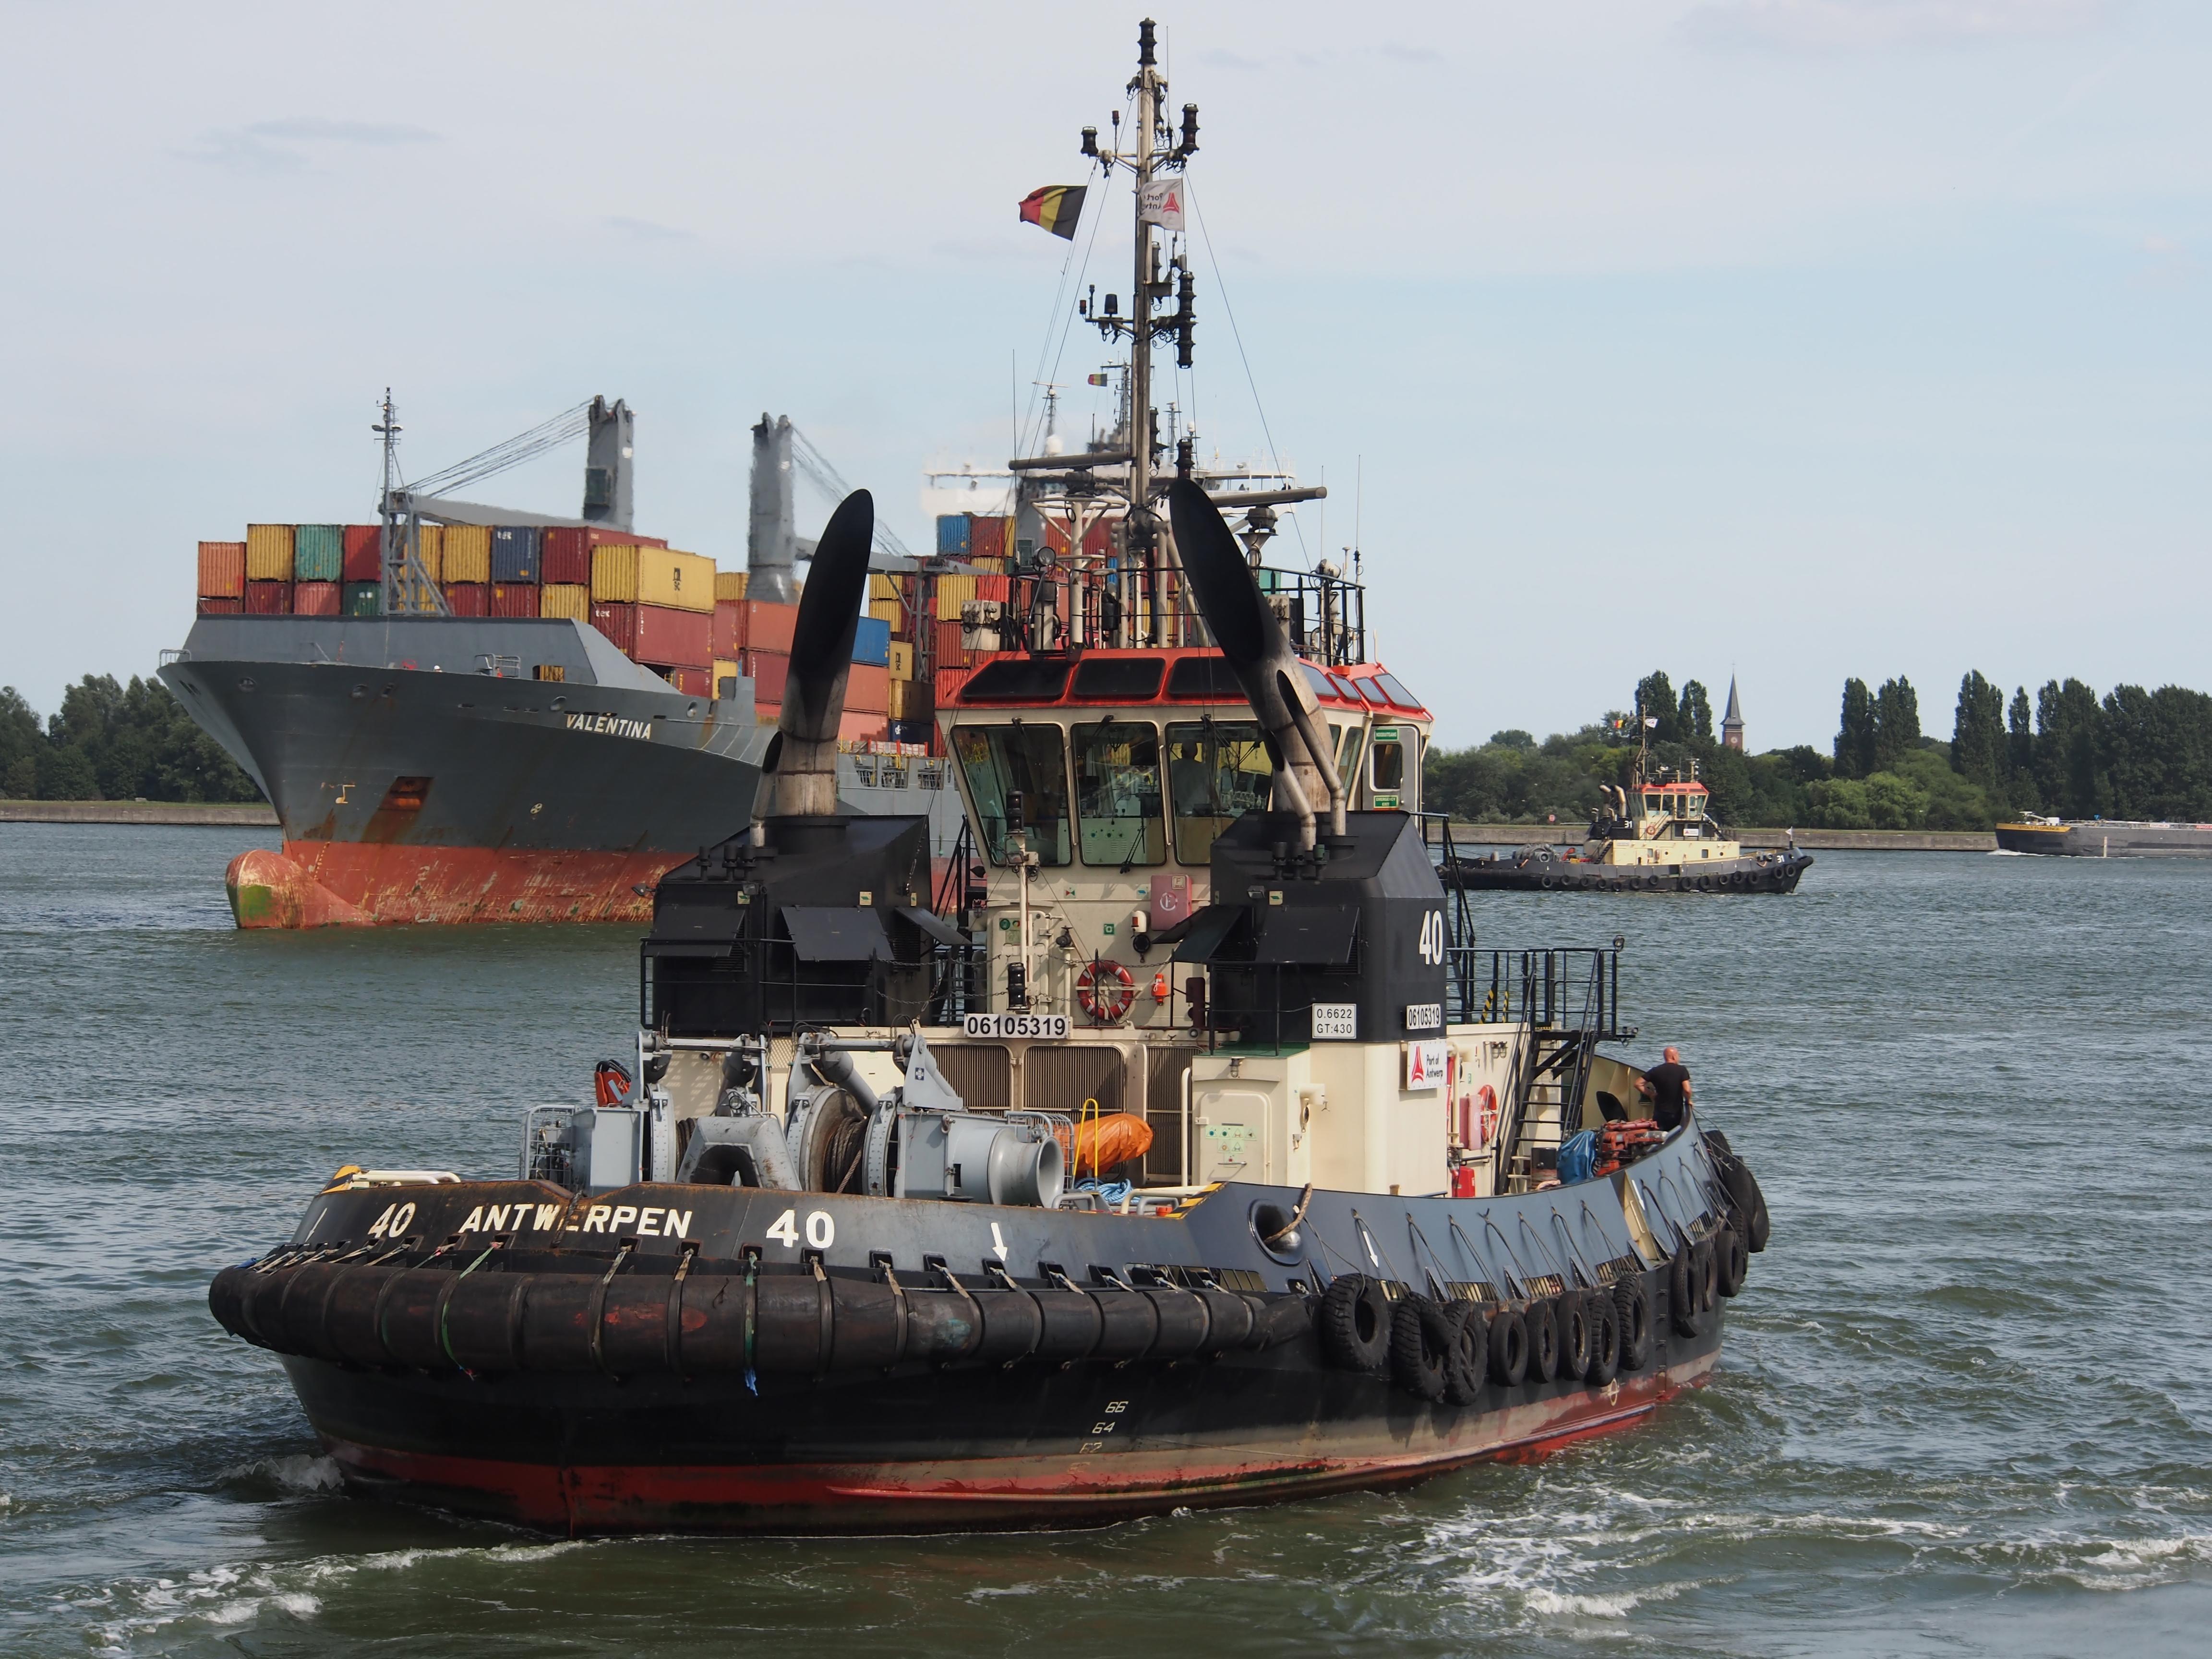 File:Tug 40 - IMO 9602095, Berendrechtsluis, pic3 JPG